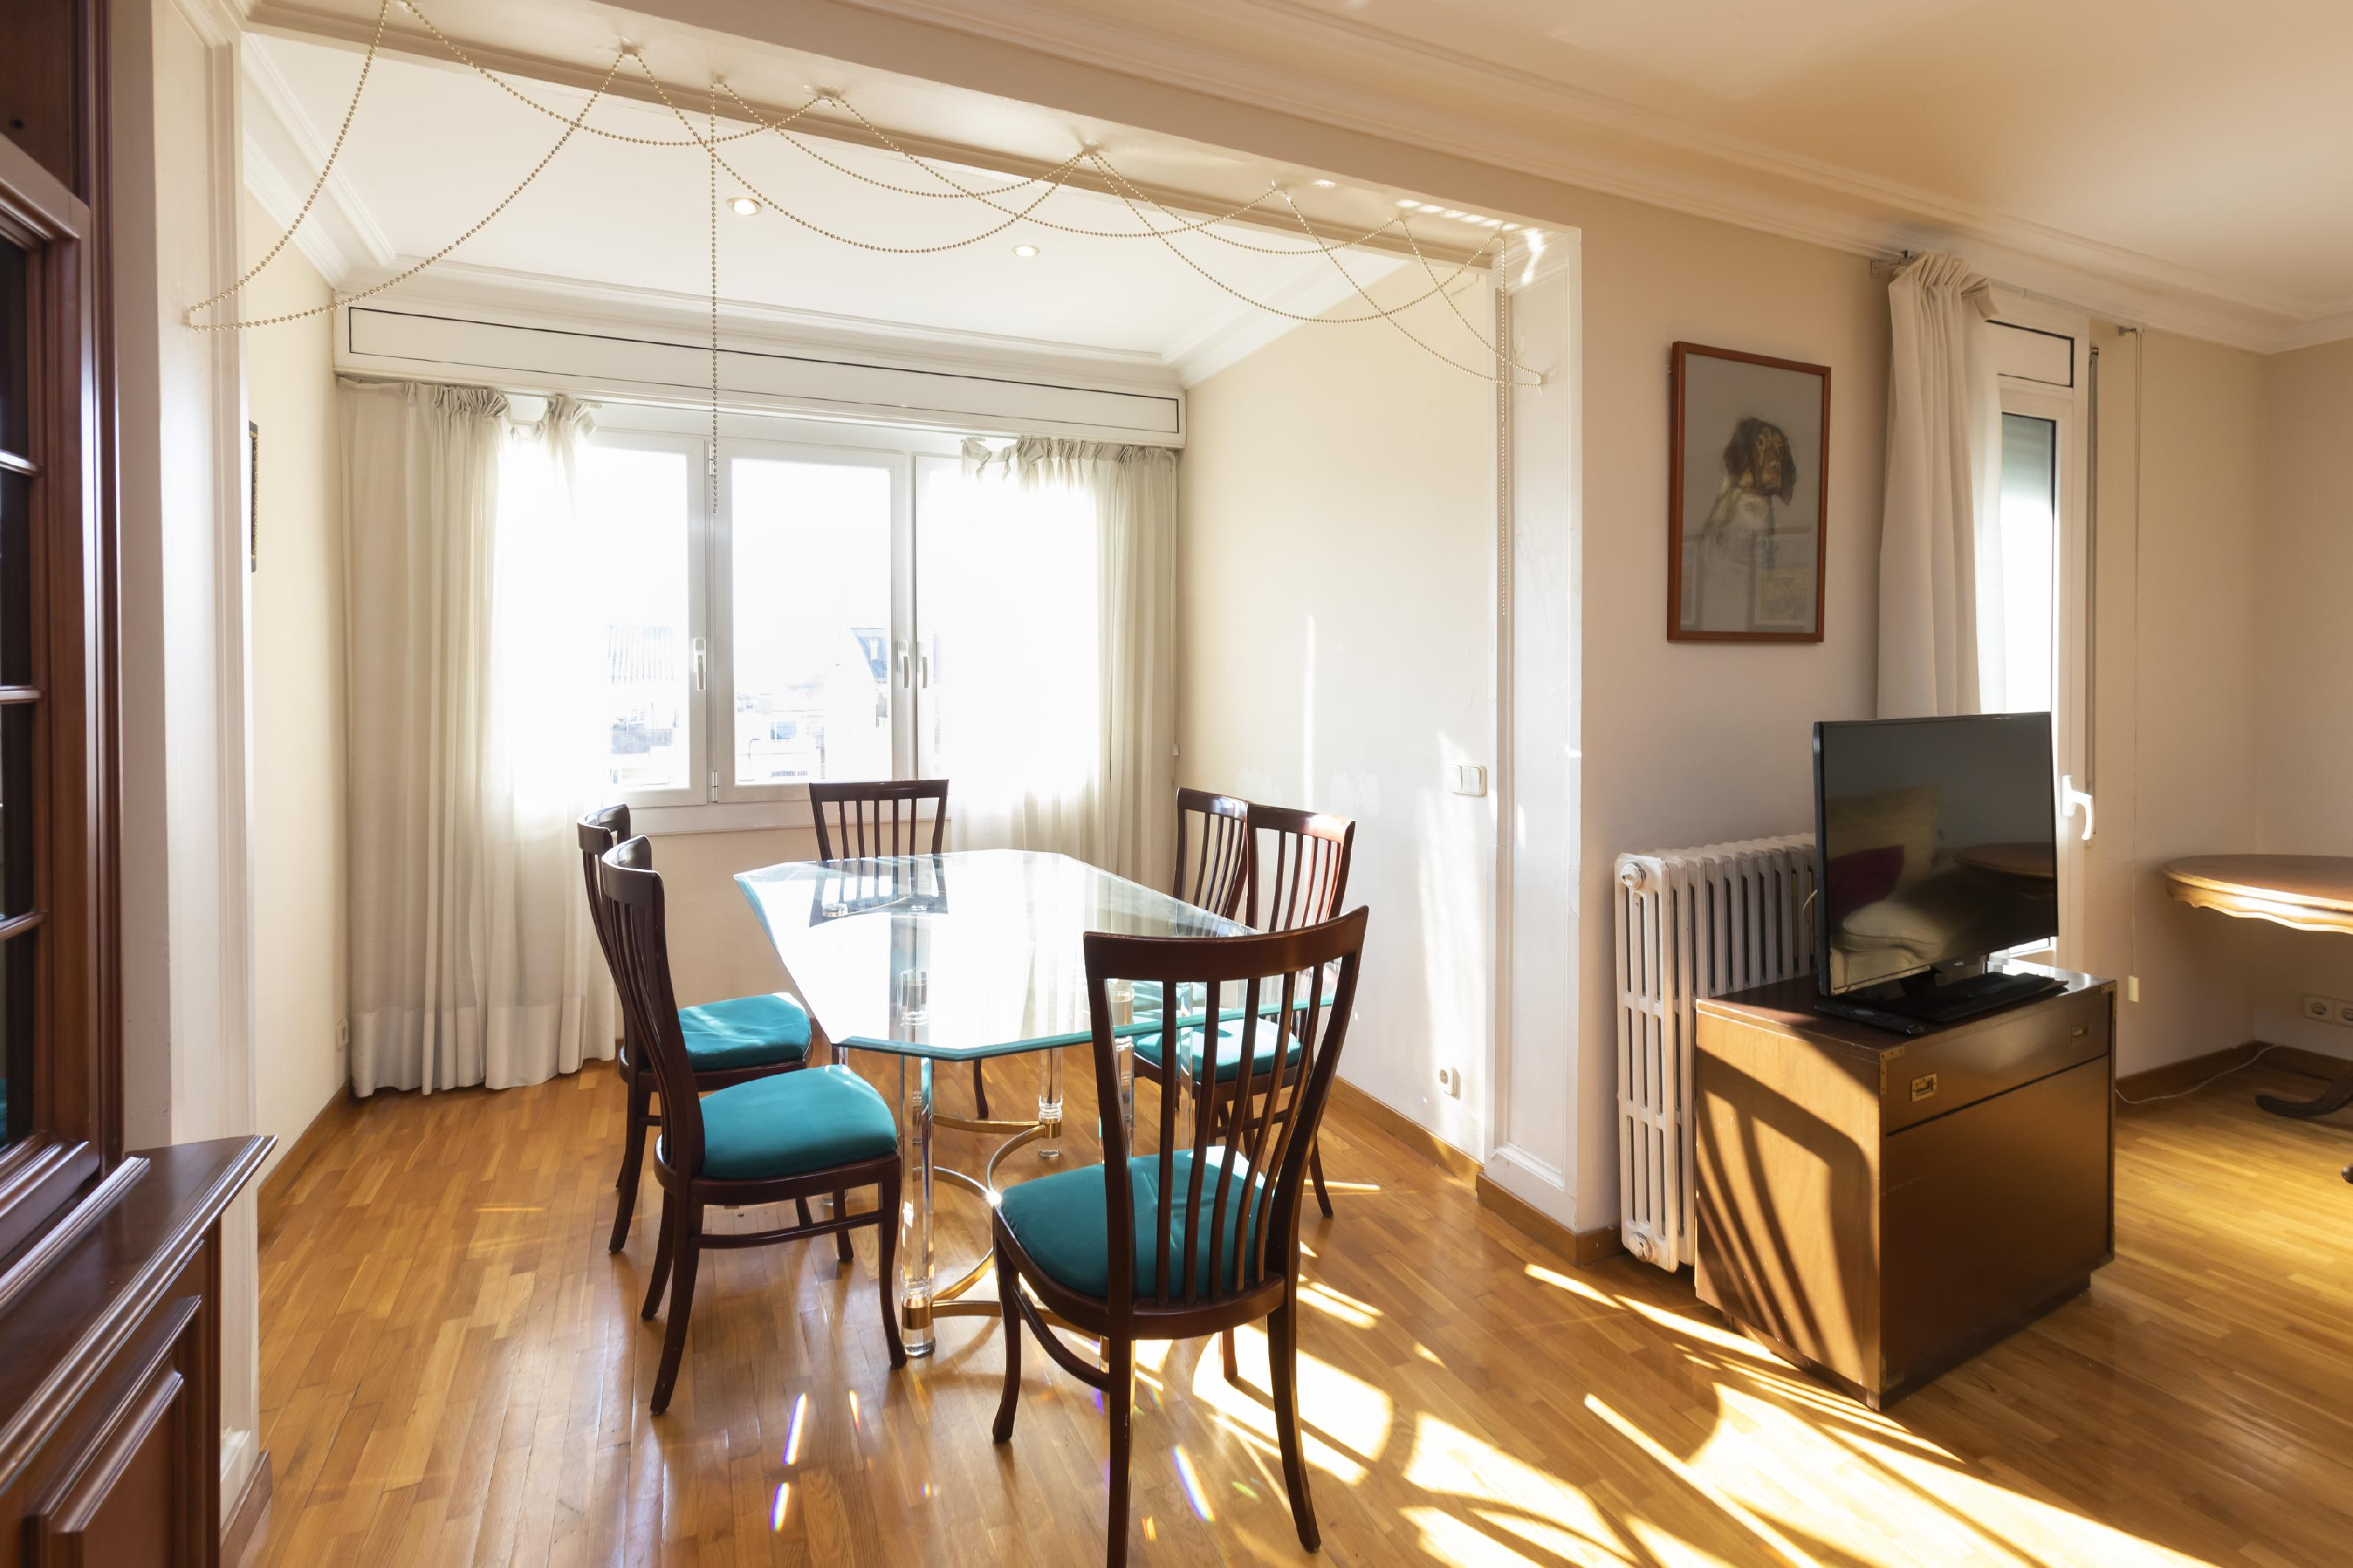 247097 Flat for sale in Sarrià-Sant Gervasi, Sant Gervasi-Galvany 7